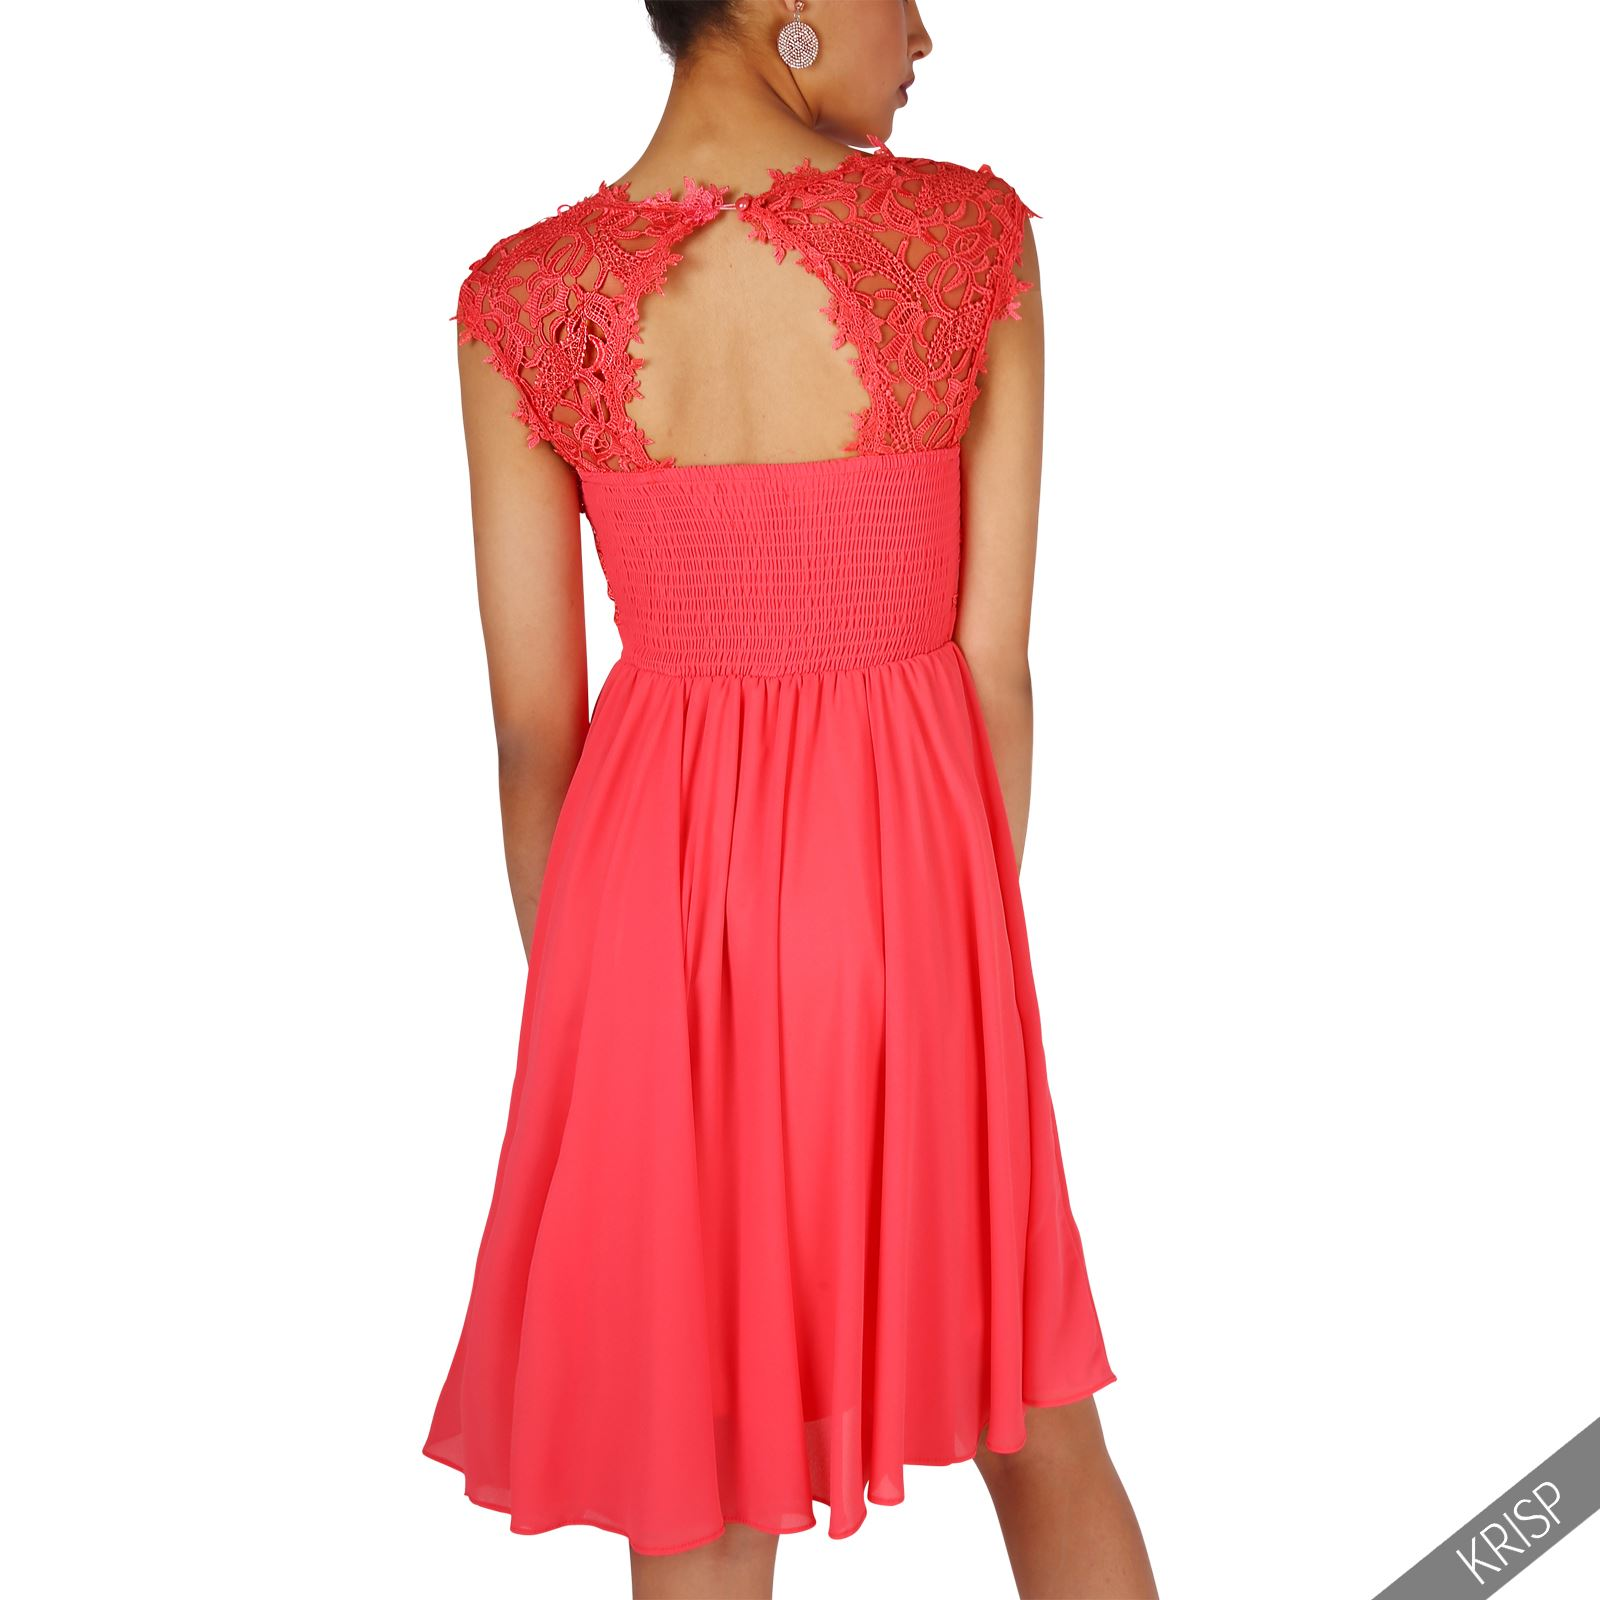 femmes robe asym trique mousseline soie tenue soir e dentelle crochet bal gala ebay. Black Bedroom Furniture Sets. Home Design Ideas